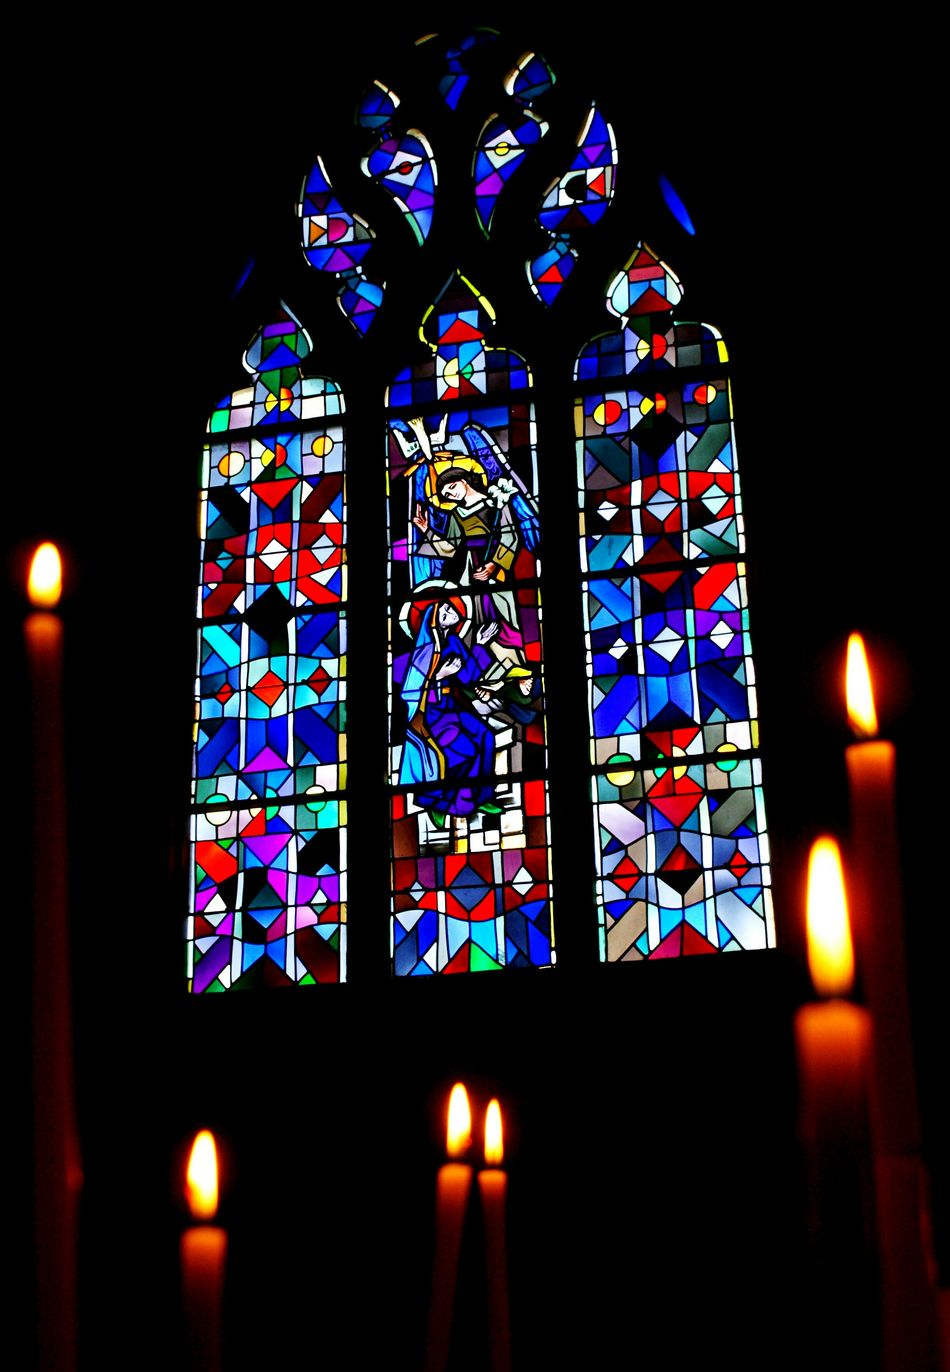 Church Catholic Church Vitrail Vitraux Saint Michel Cierges Religion Beautifully Organized